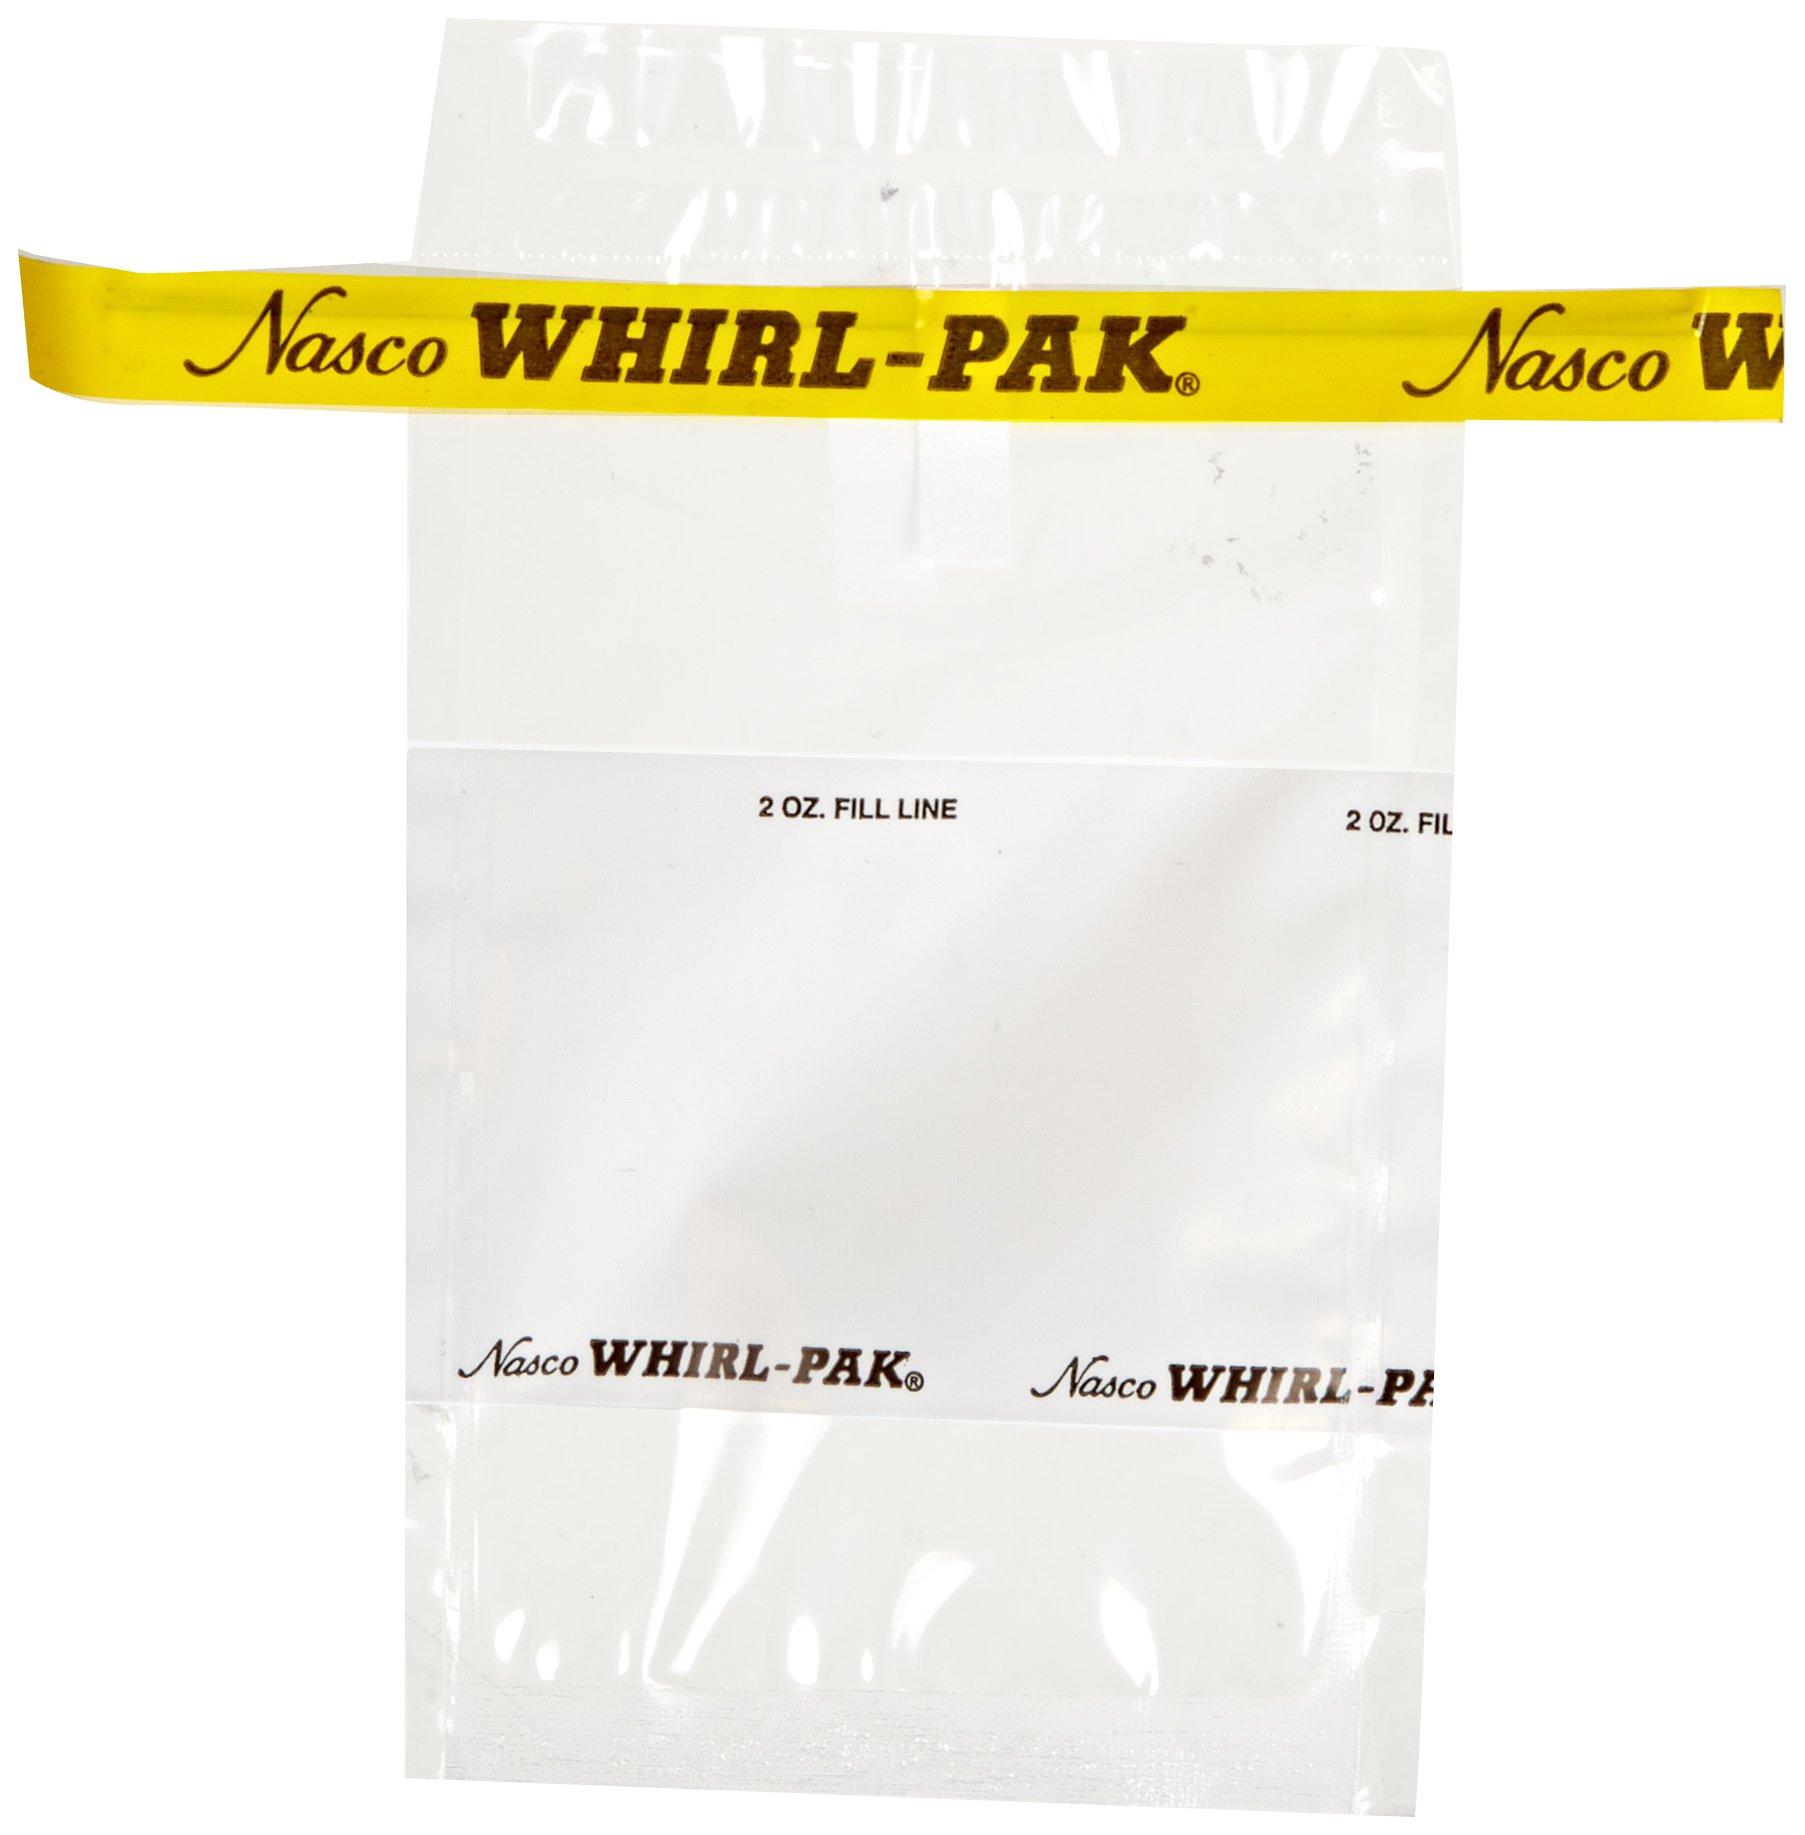 Nasco Whirl-Pak B01064WA Write-On Bag, 12.5cm L x 7.5cm W, 0.057mm Thickness, 58ml Capacity (Box of 500)